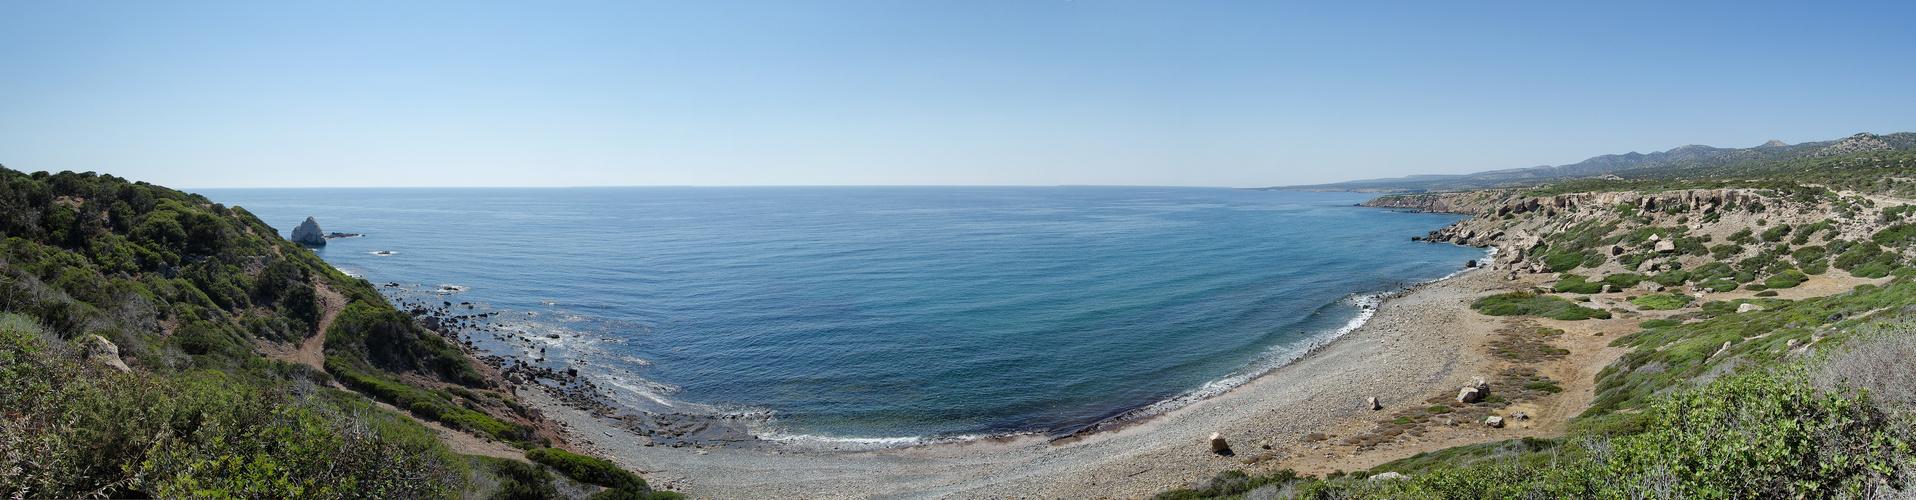 Zypern Westküste